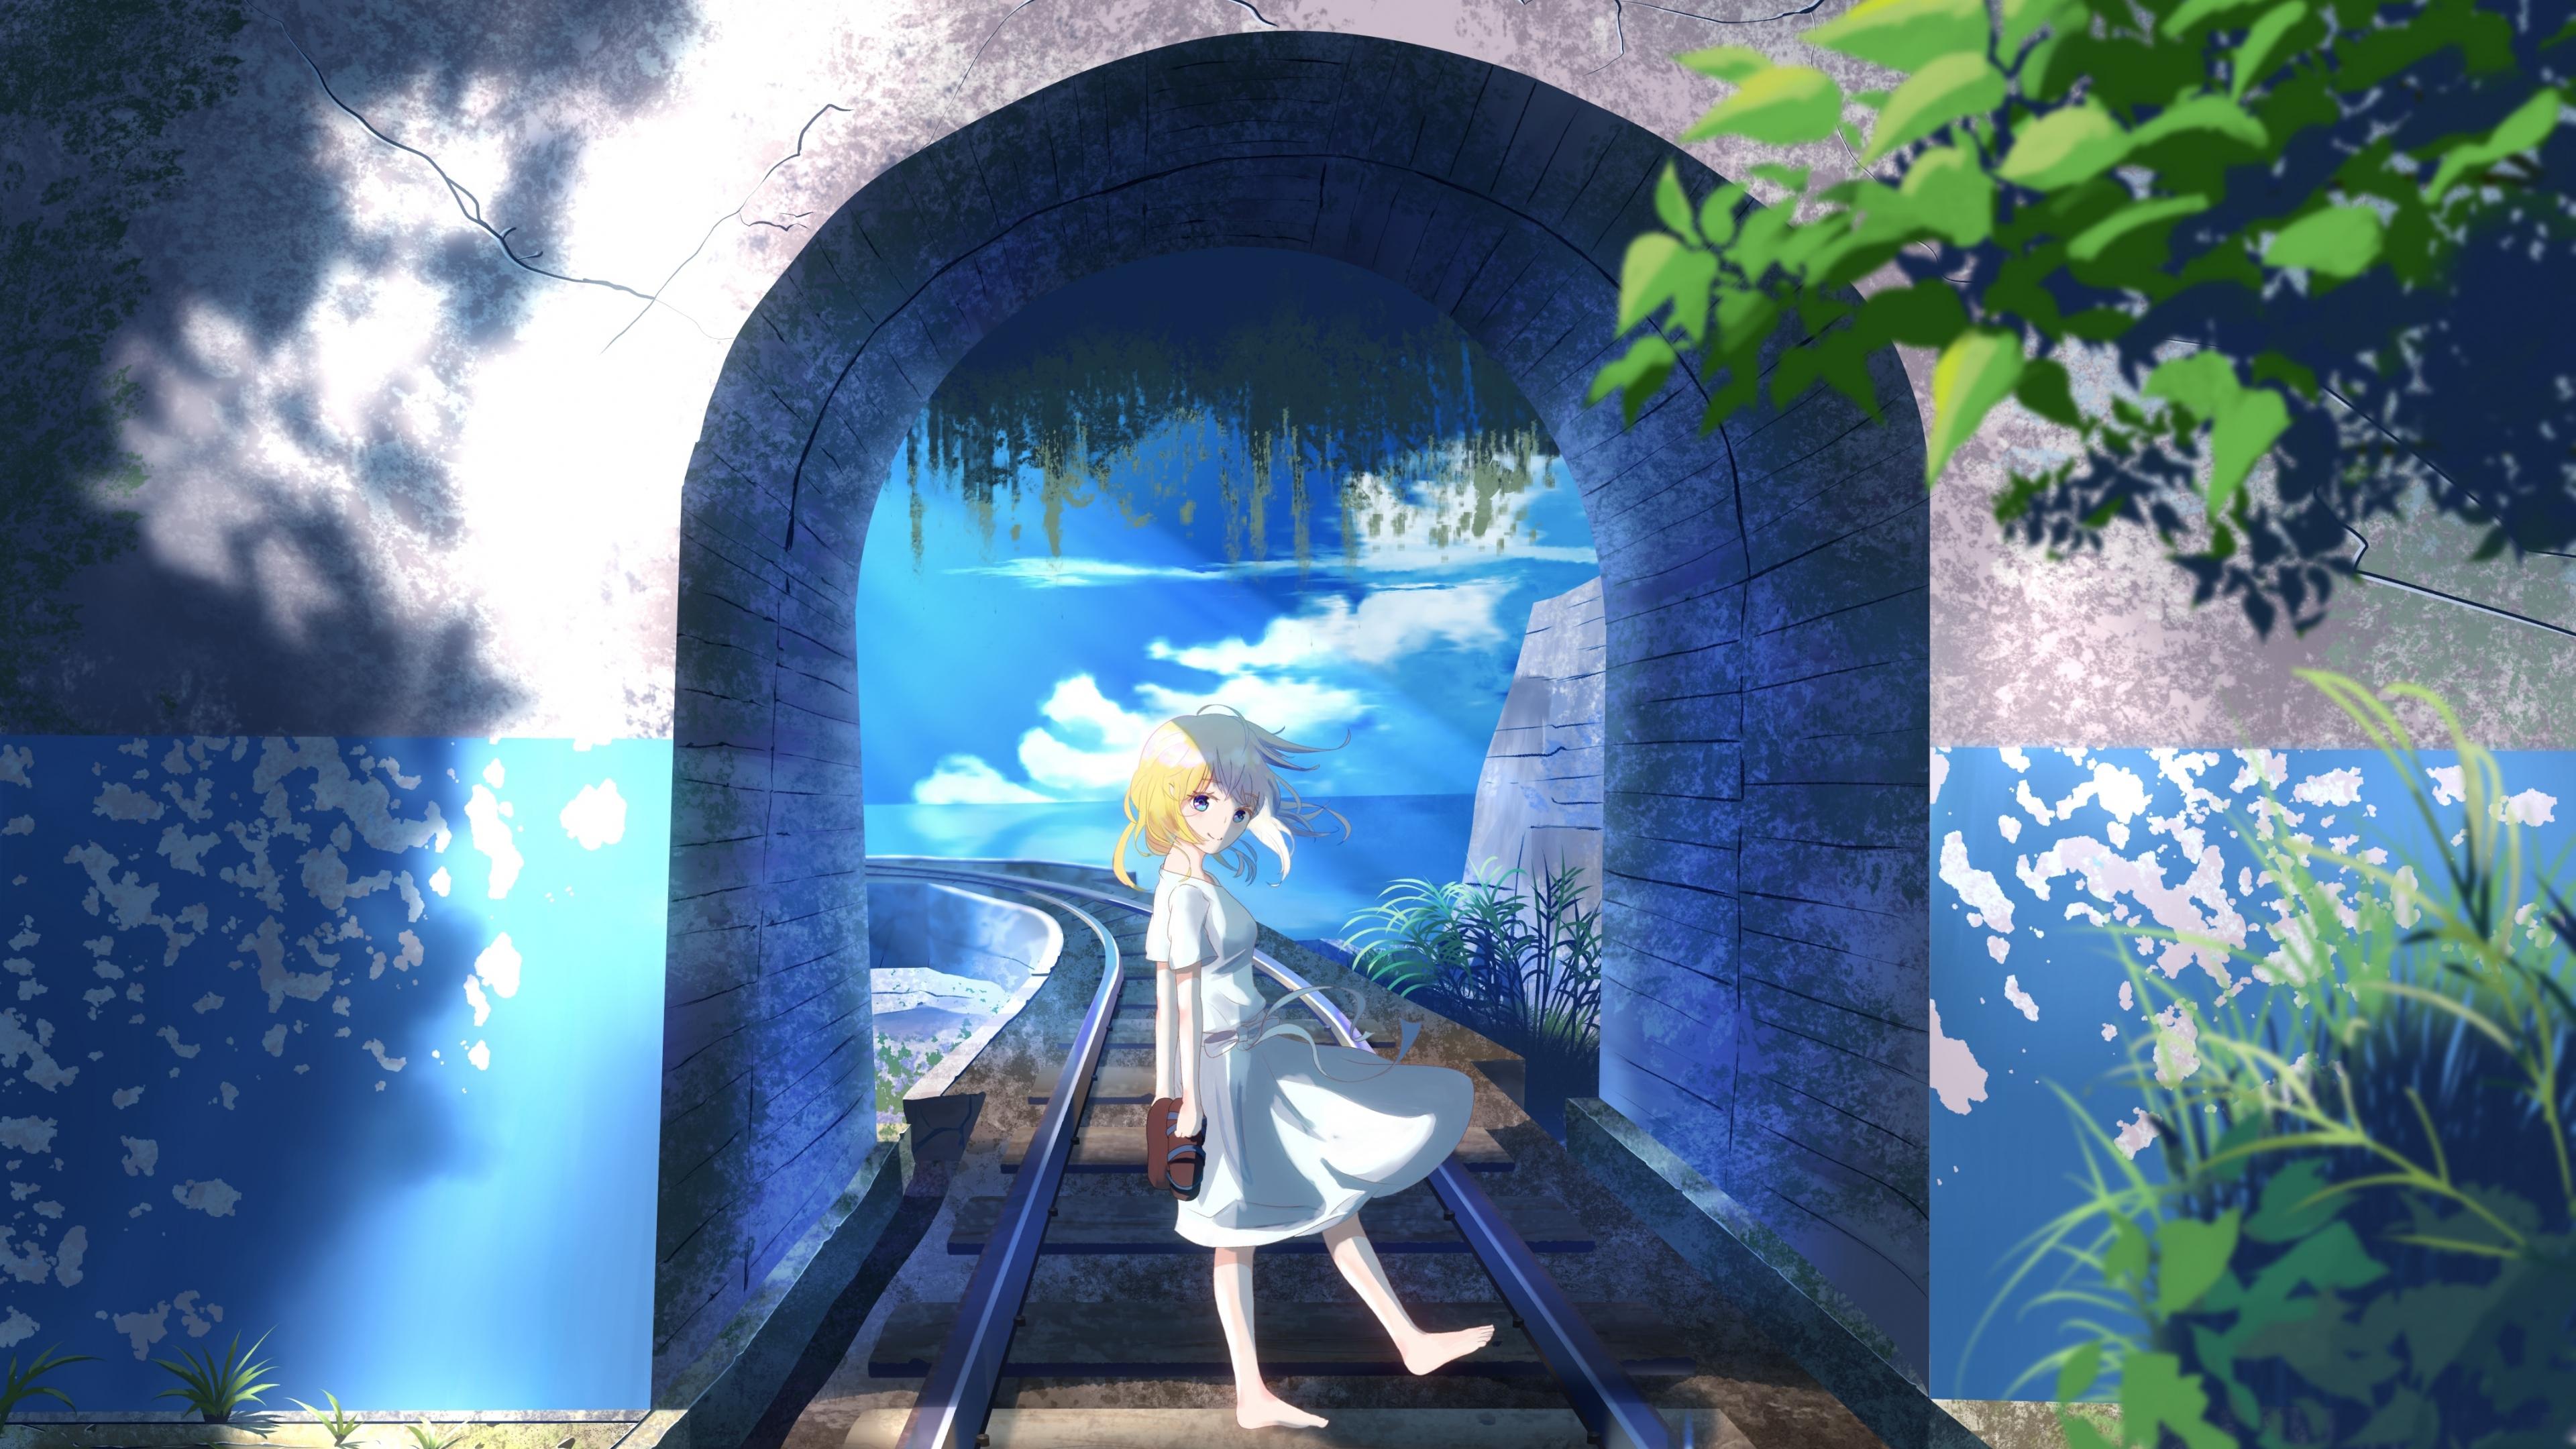 Download 3840x2160 Wallpaper Anime Girl Original Railroad 4k Uhd 16 9 Widescreen 3840x2160 Hd Image Background